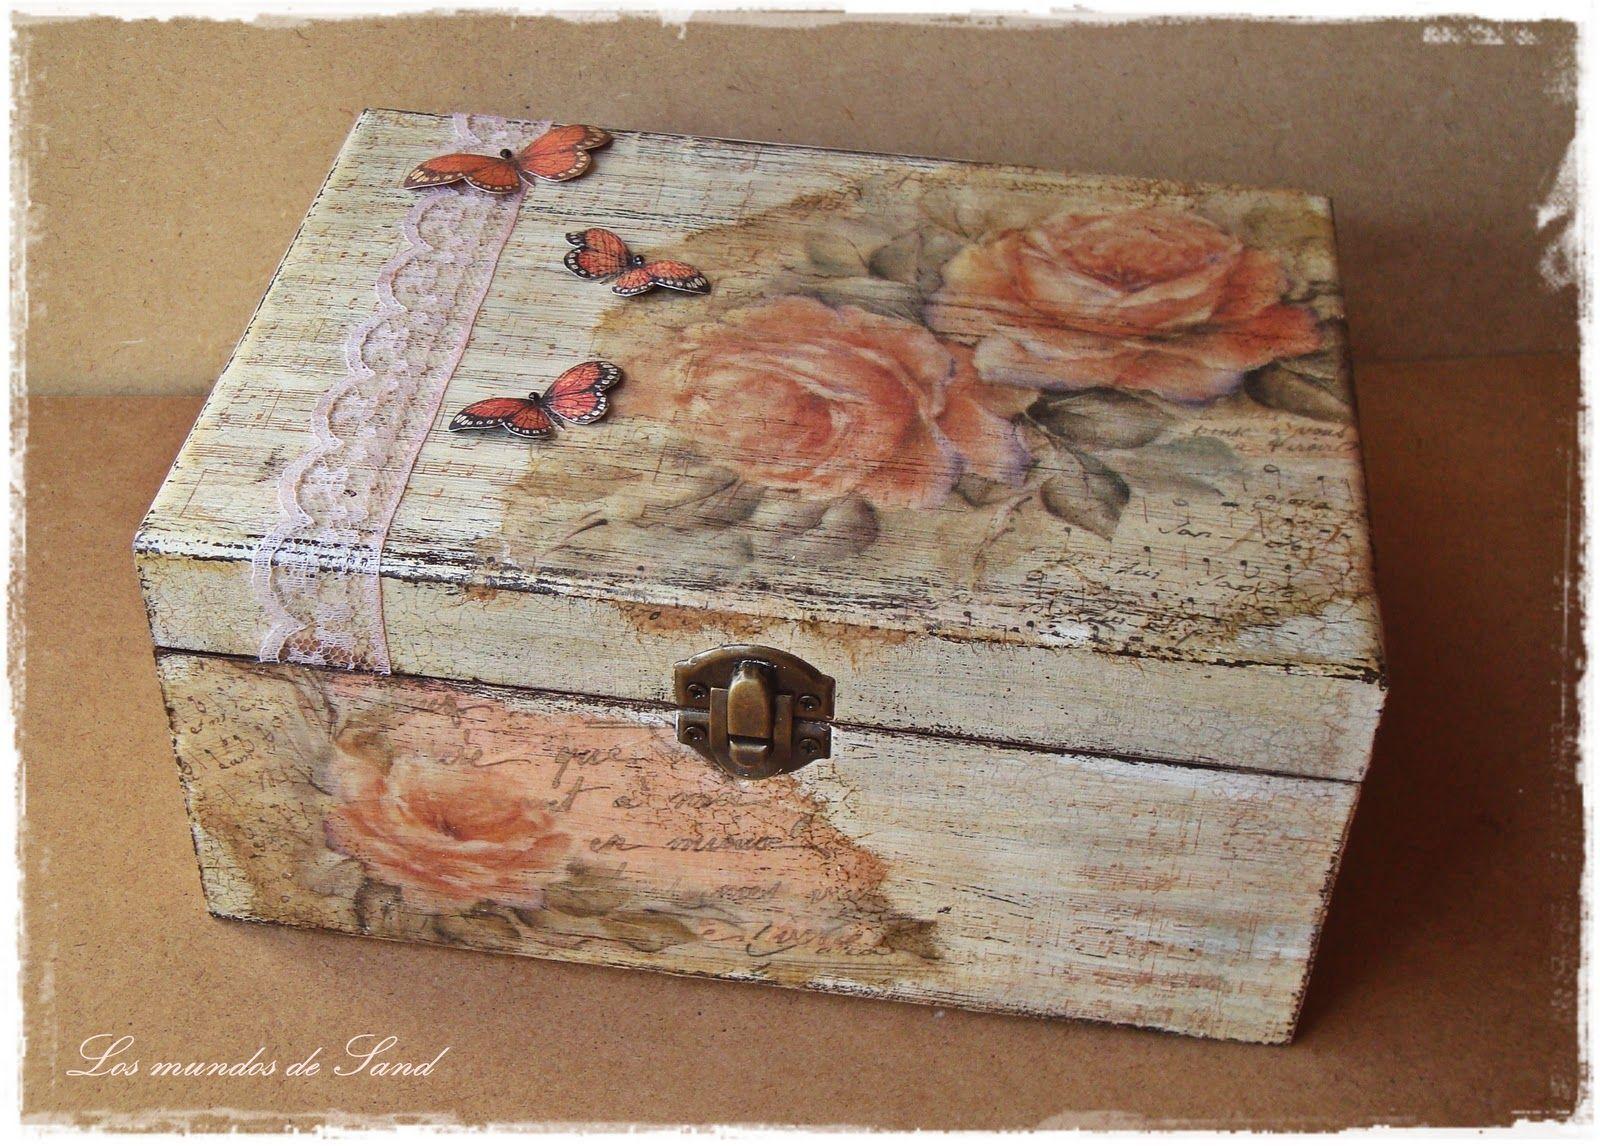 Pin de asun plaza hermida en cajas pinterest cajas - Cajas decoradas a mano ...